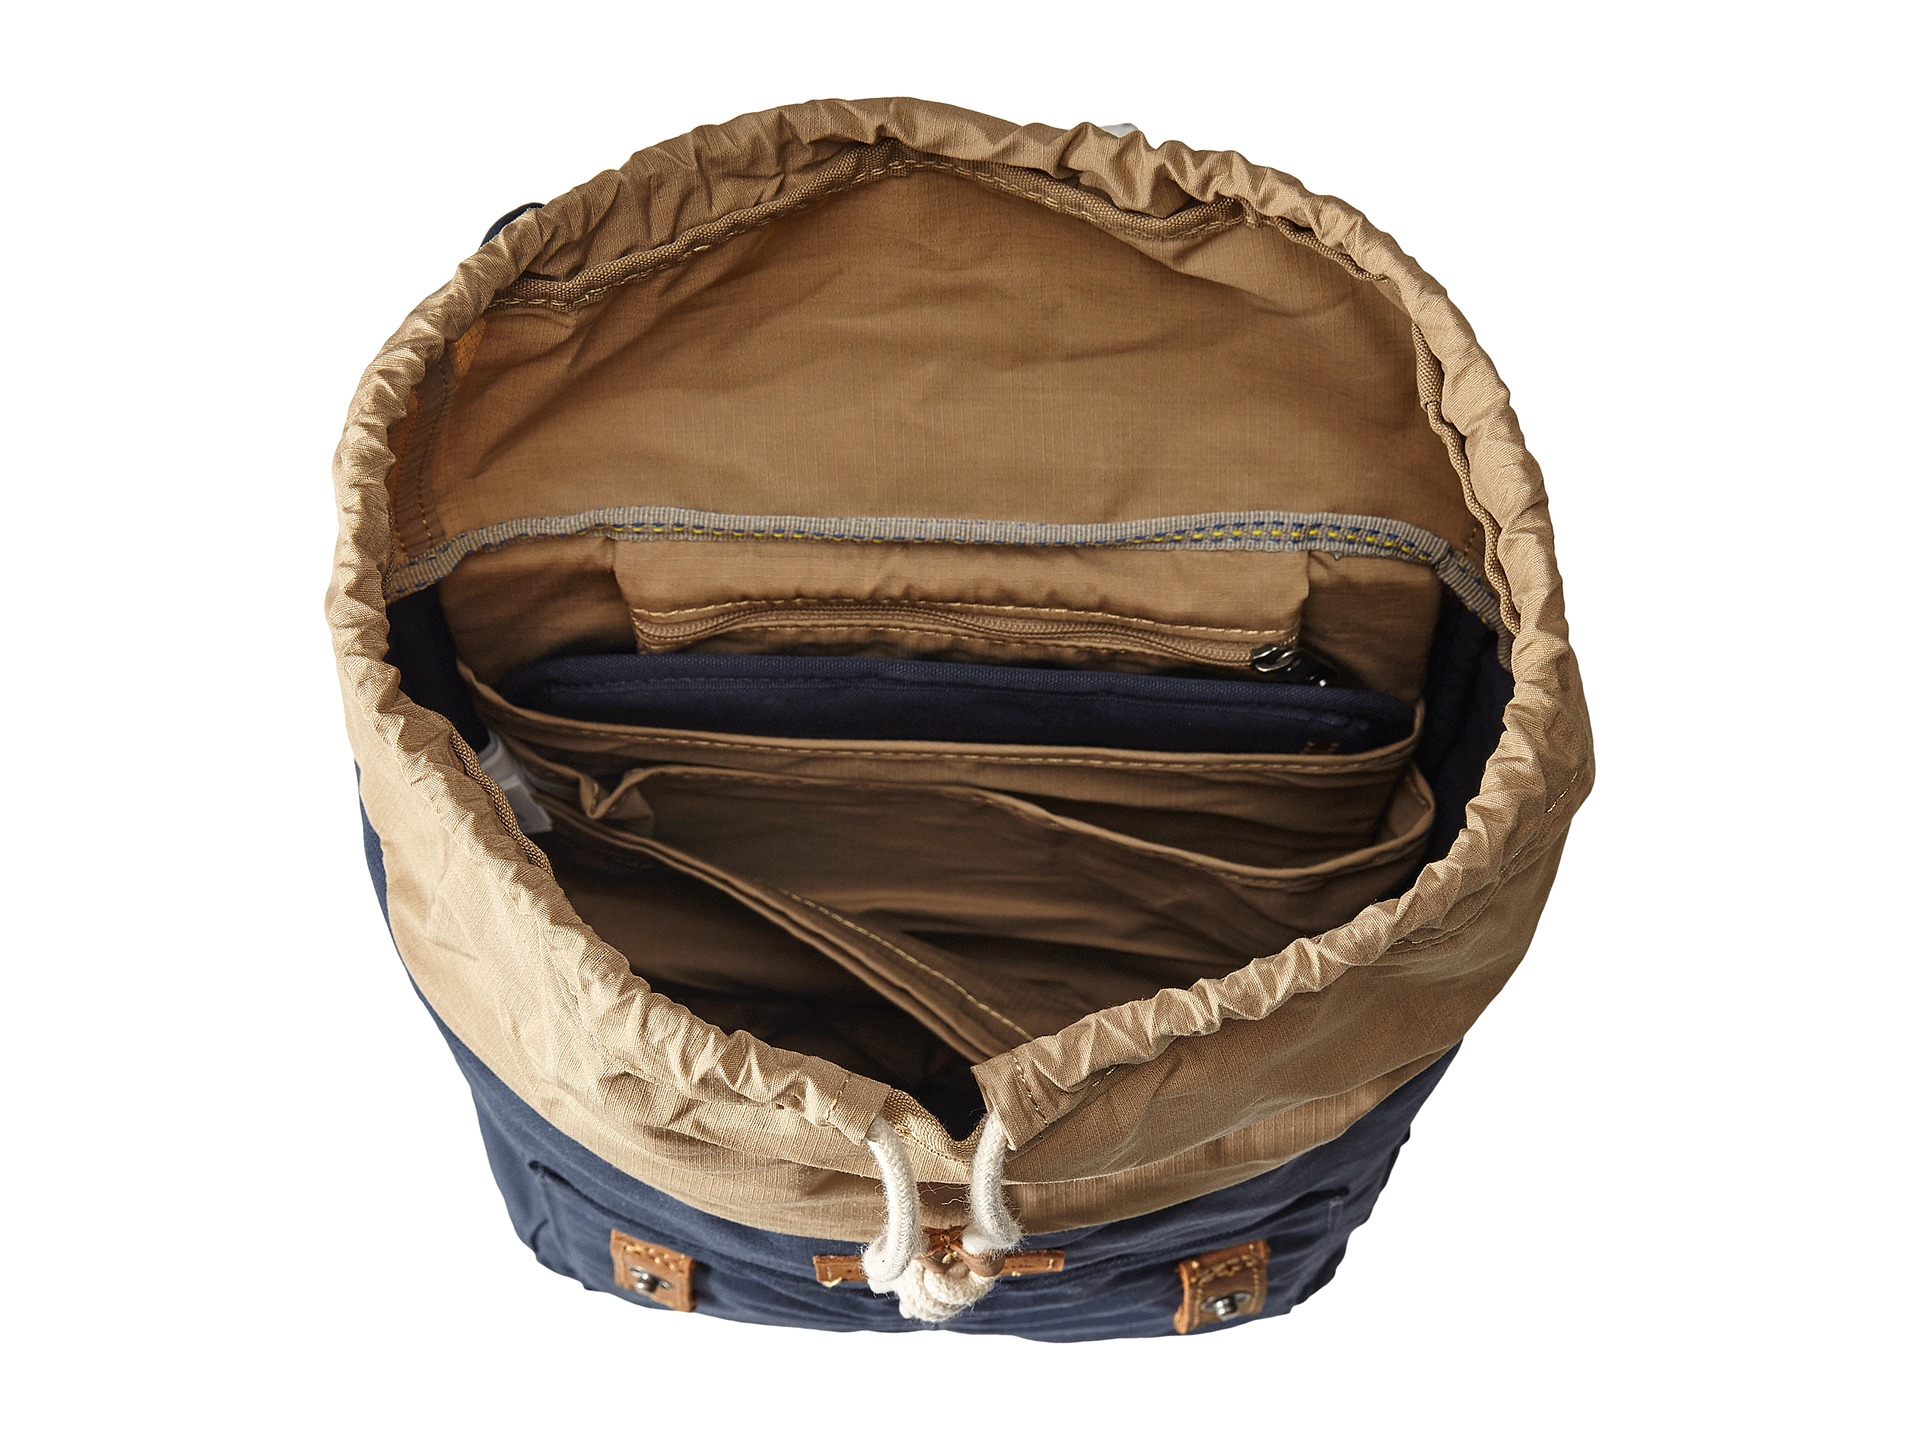 fj llr ven rucksack mini free shipping. Black Bedroom Furniture Sets. Home Design Ideas